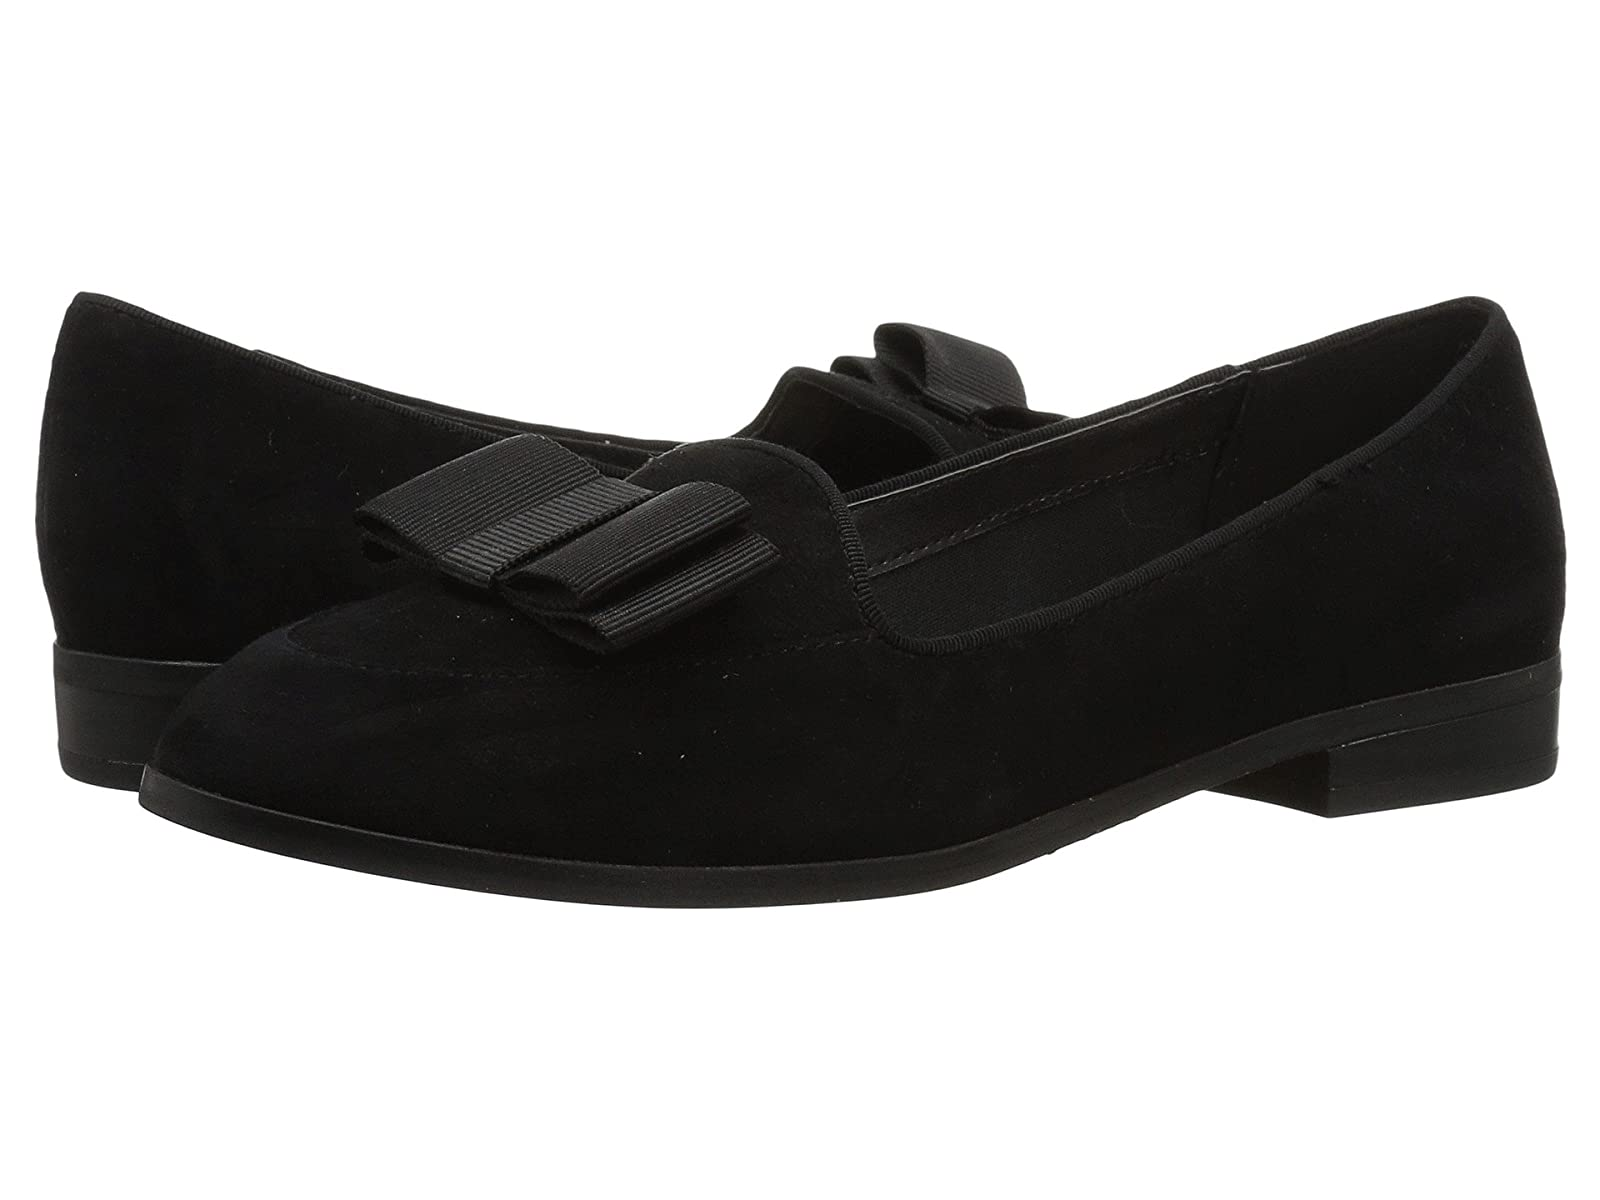 Anne Klein DakodahAtmospheric grades have affordable shoes